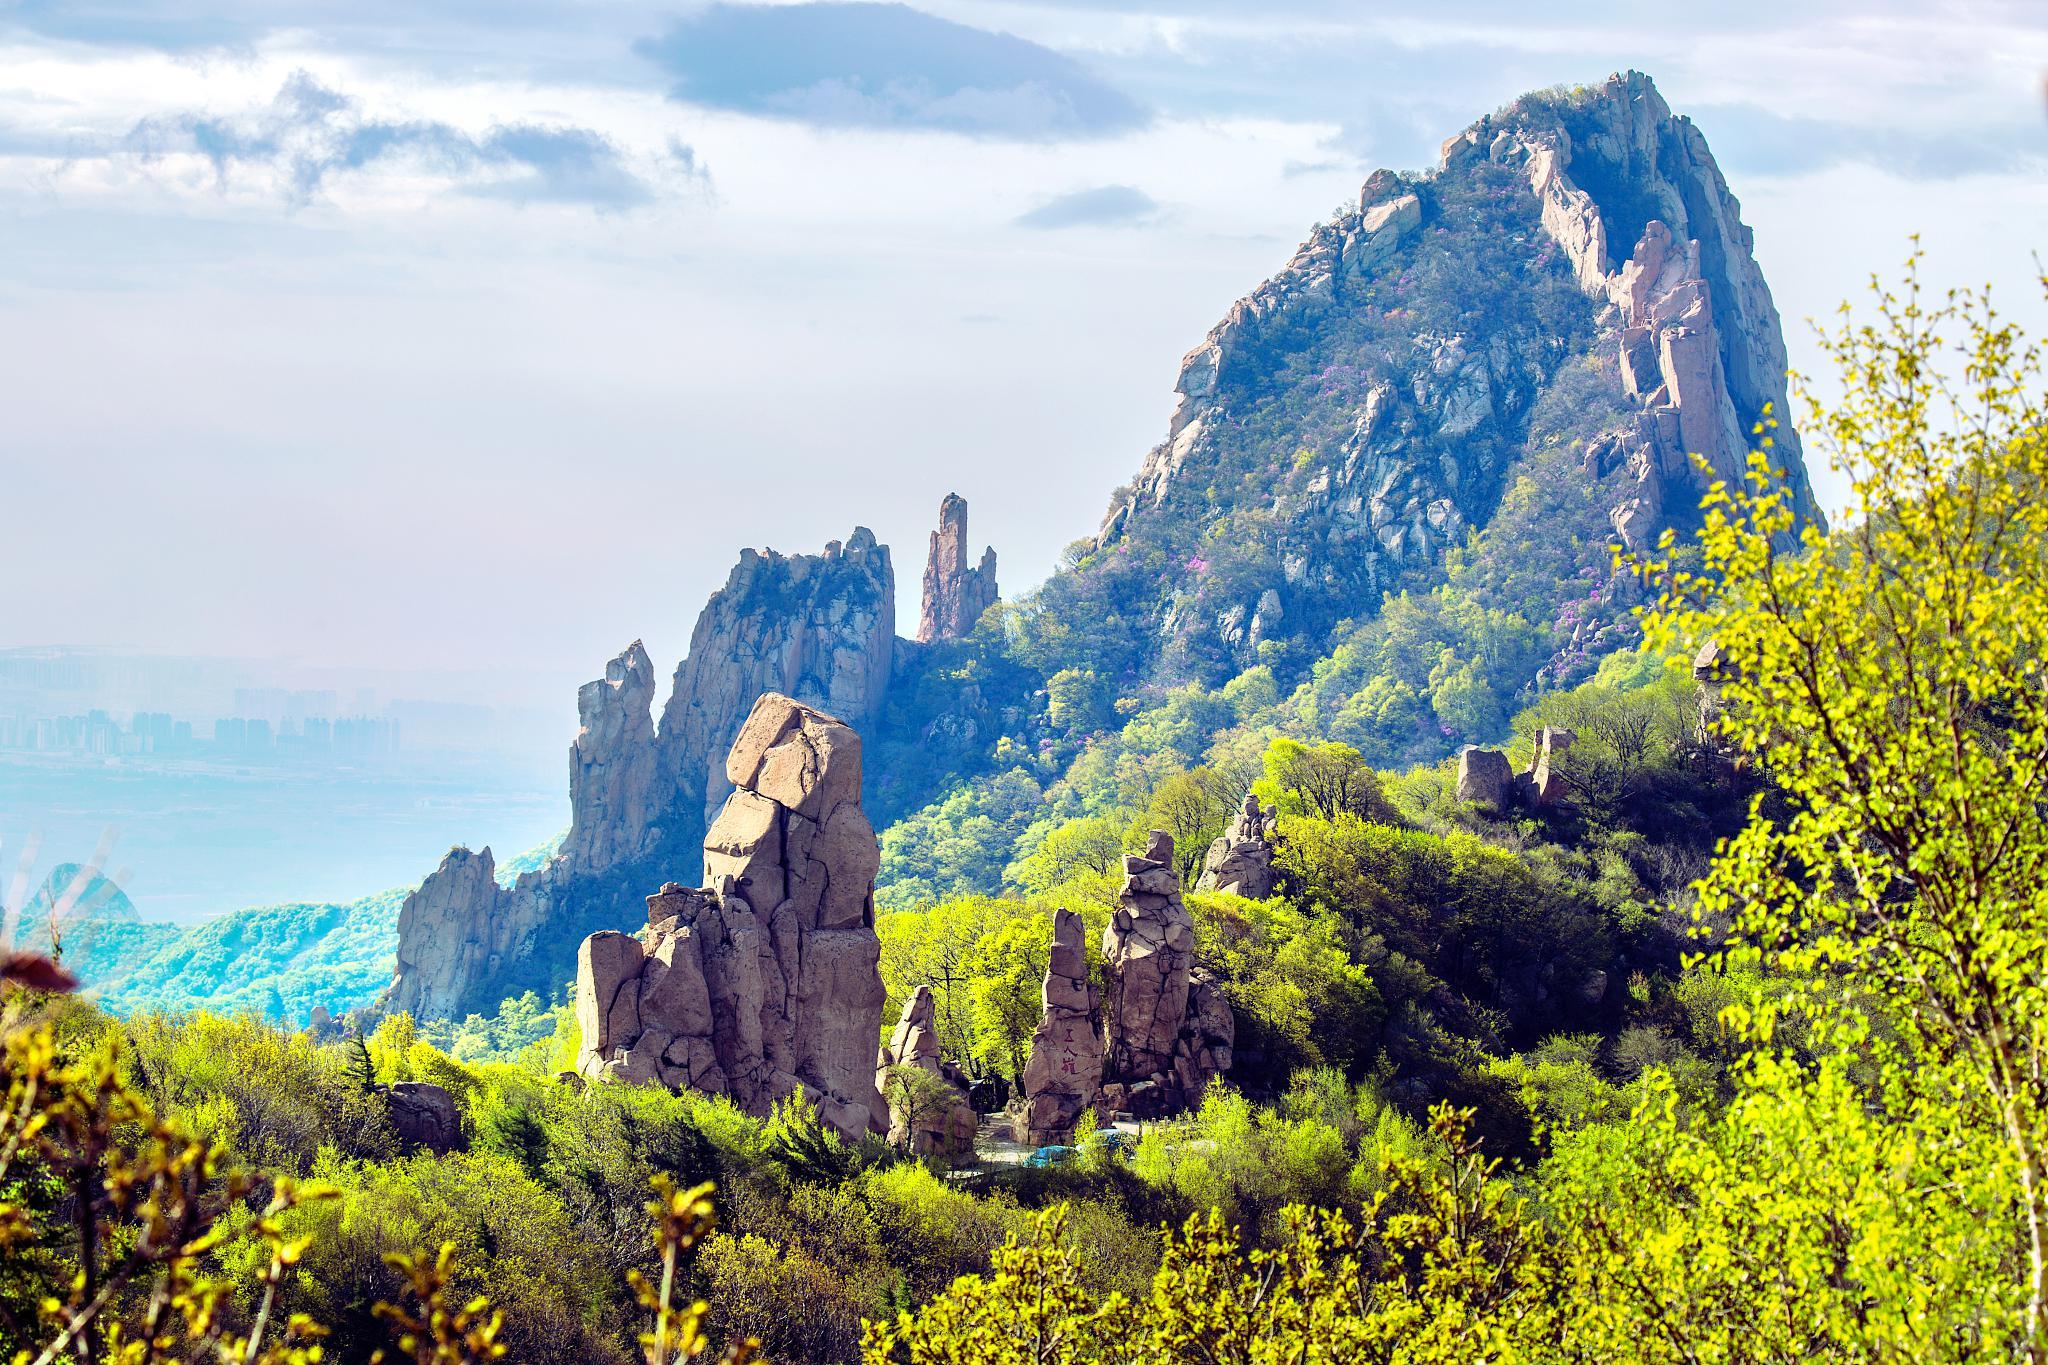 Zushan Scenic Area